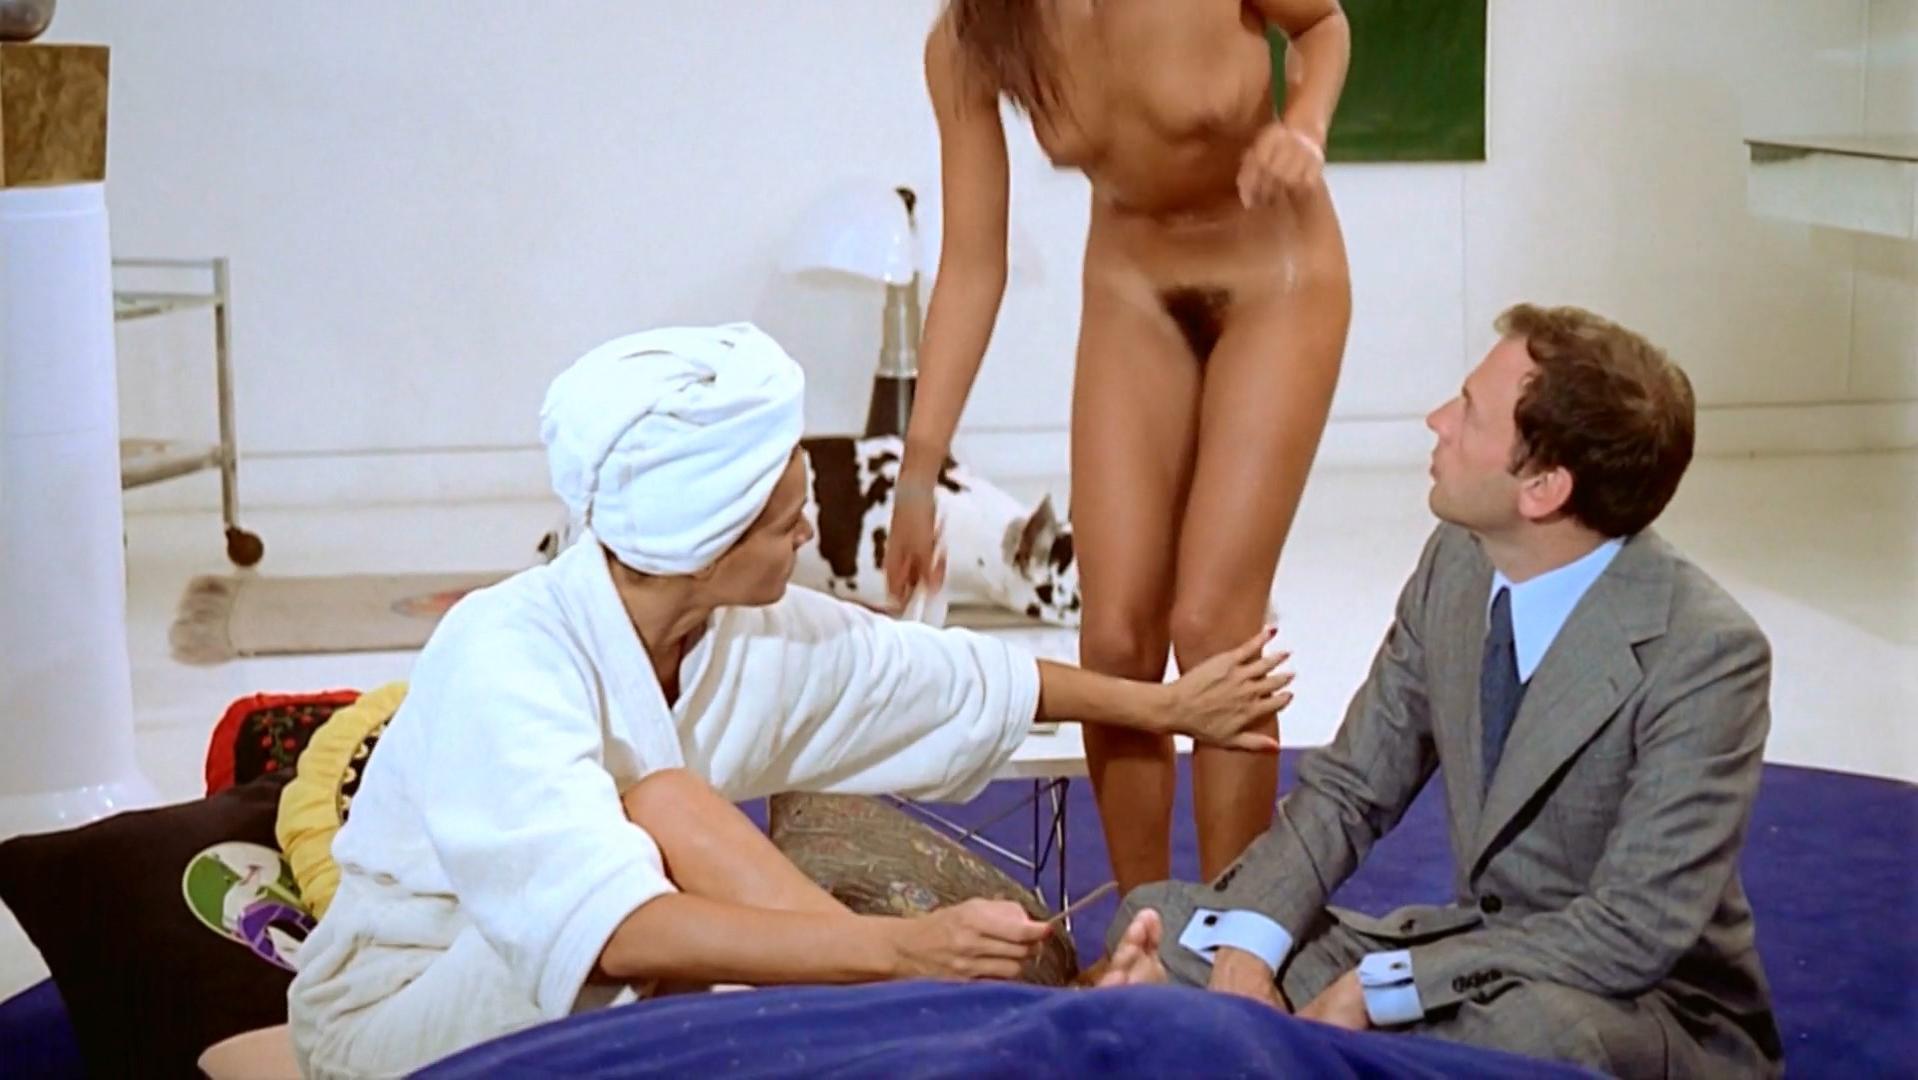 Romy Schneider nude, Christine Boisson nude, Betty Berr nude - Le Mouton Enrage (1974)